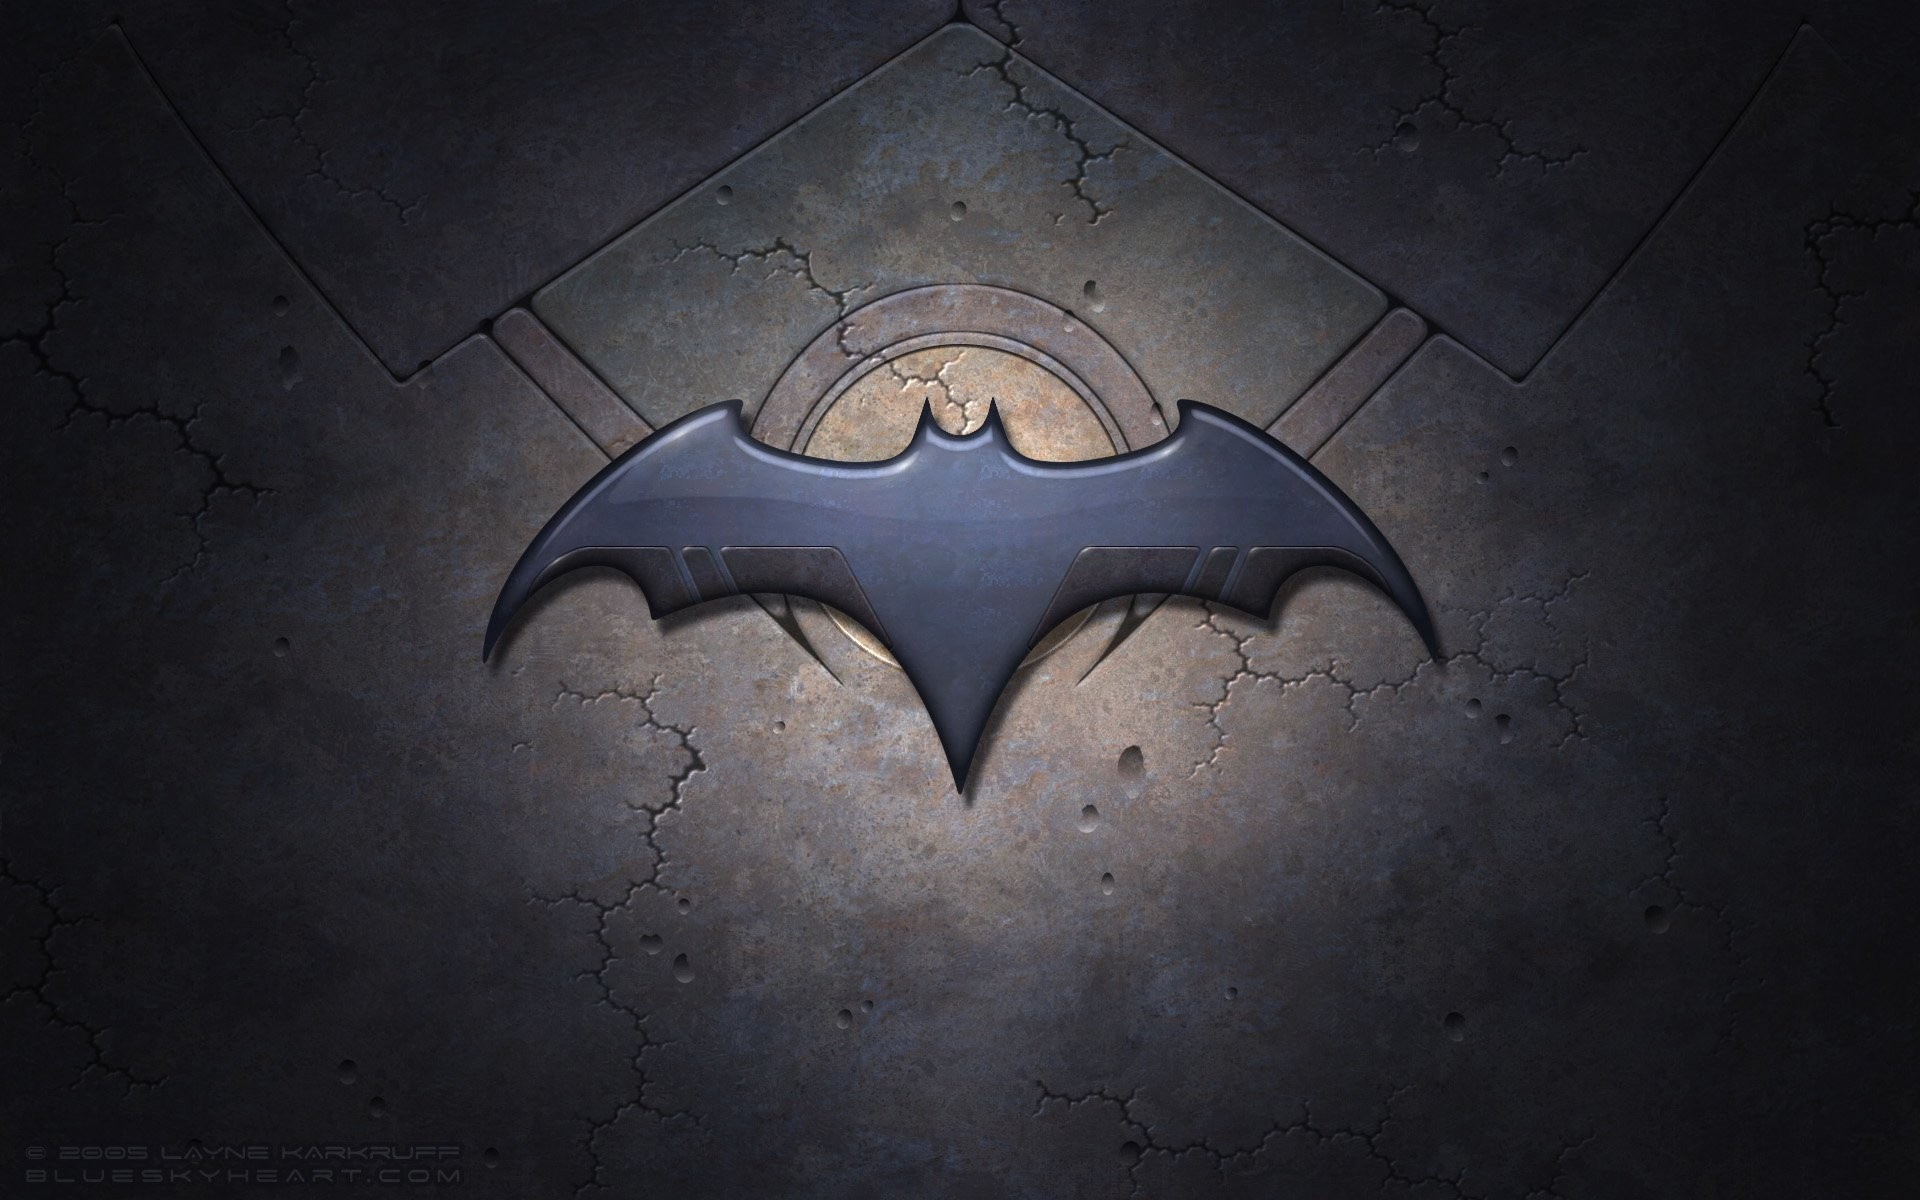 Sfondi Batman 69 Immagini